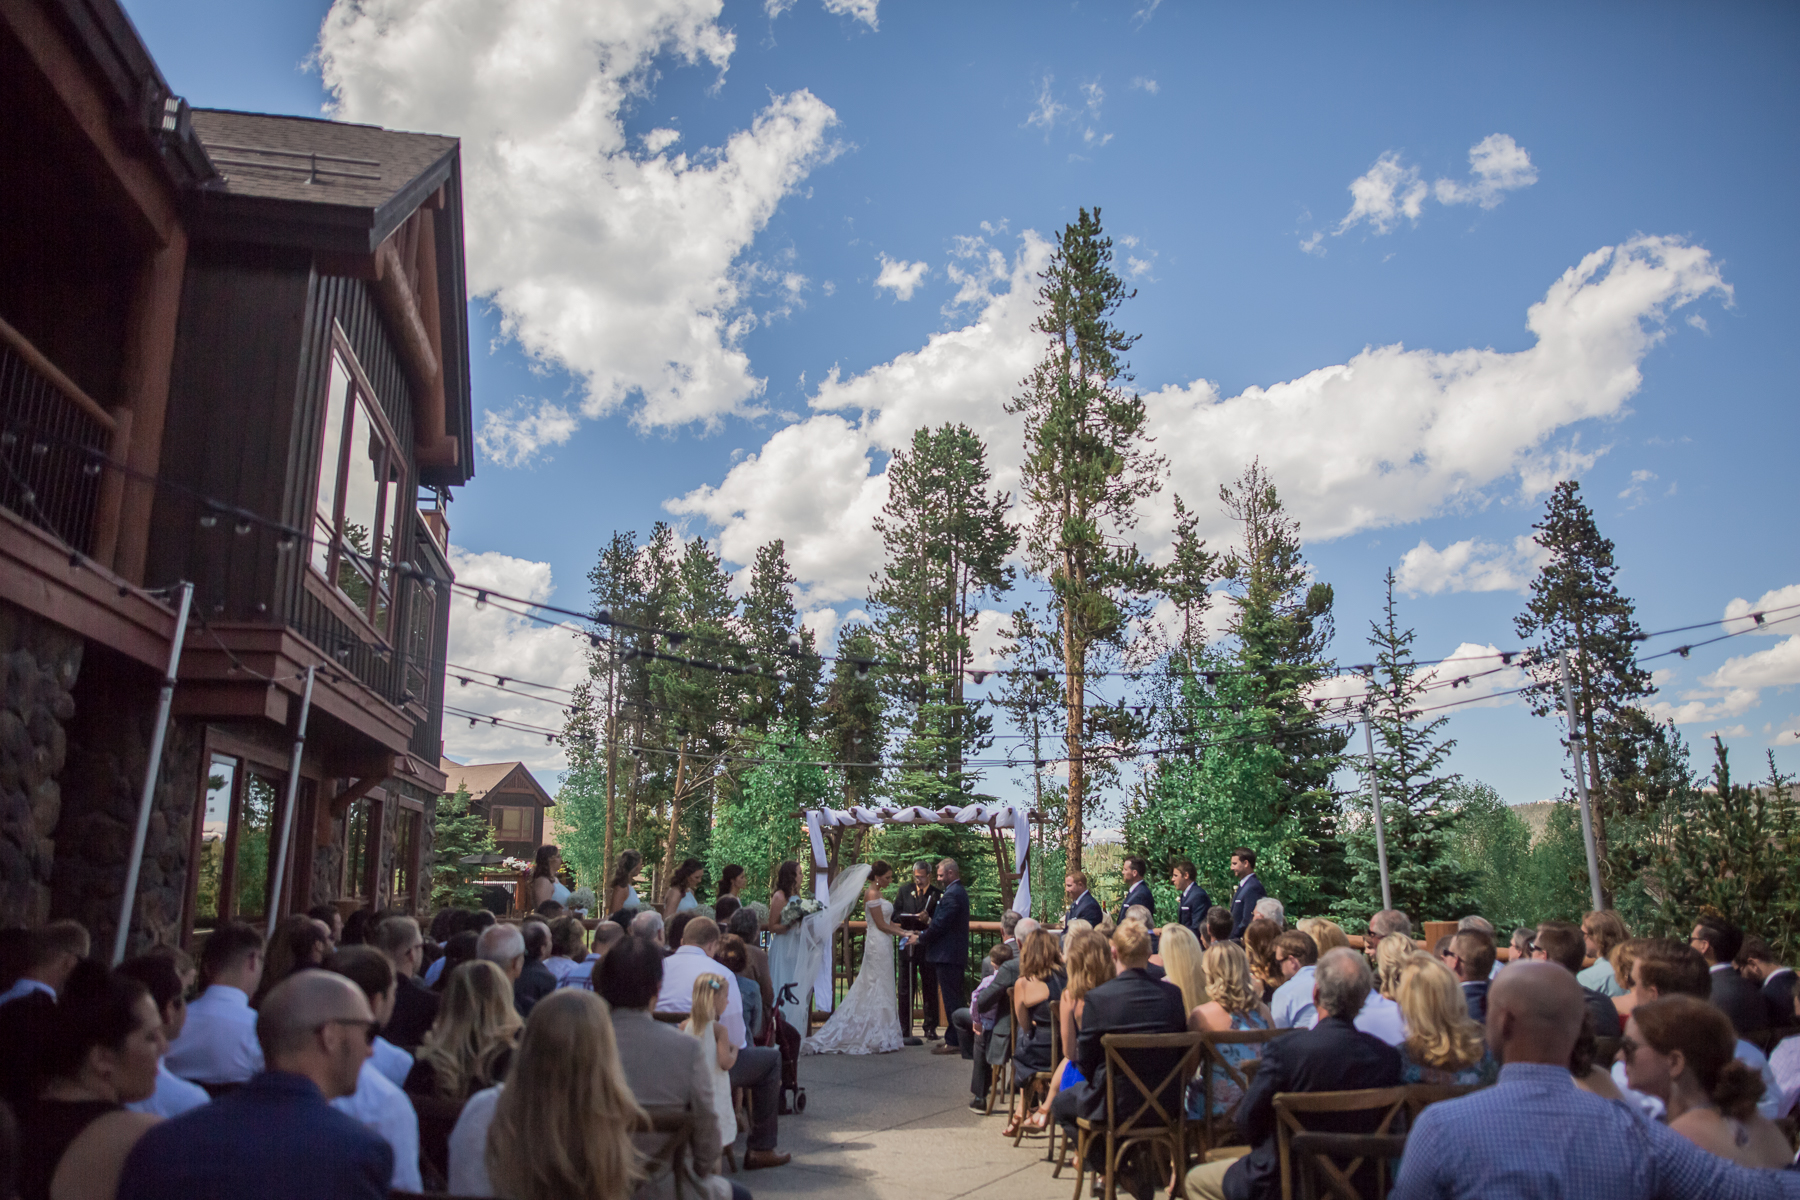 StaciDesign-Colorado-Wedding-4586.jpg